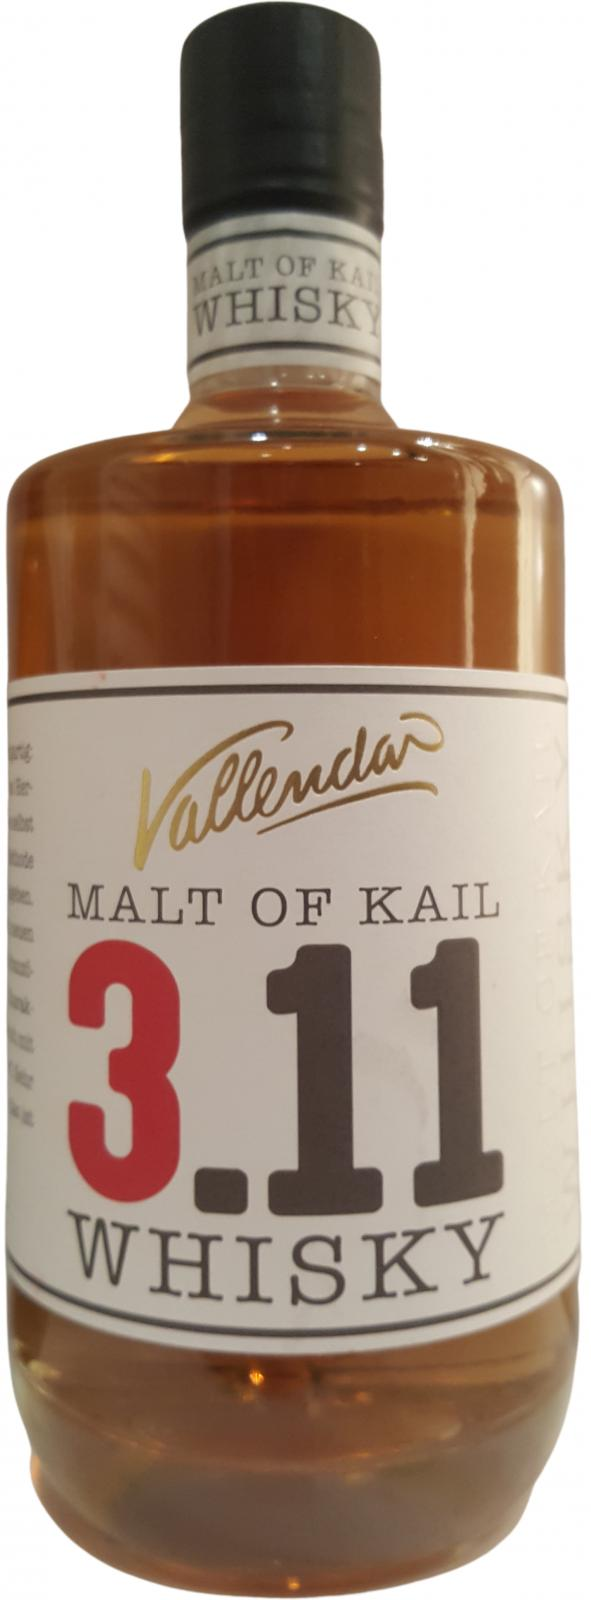 Malt of Kail 2010